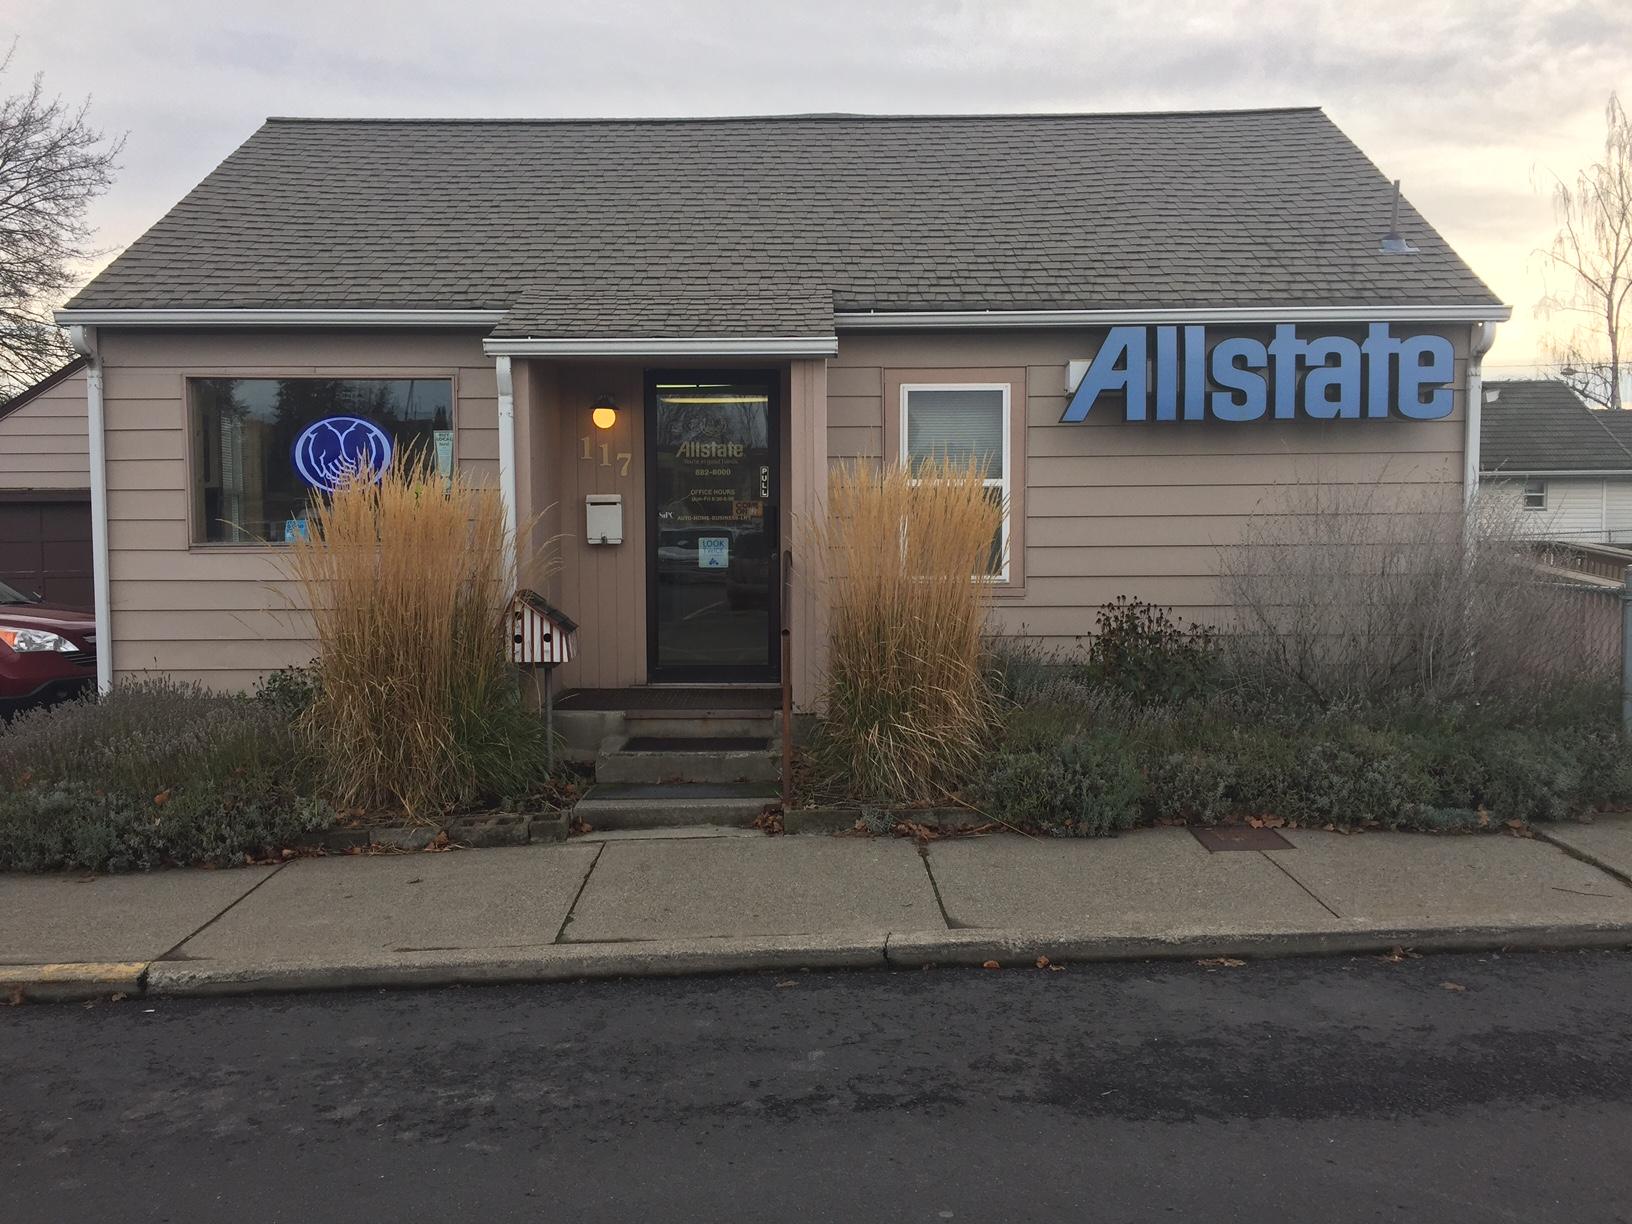 Ted Curet: Allstate Insurance image 1